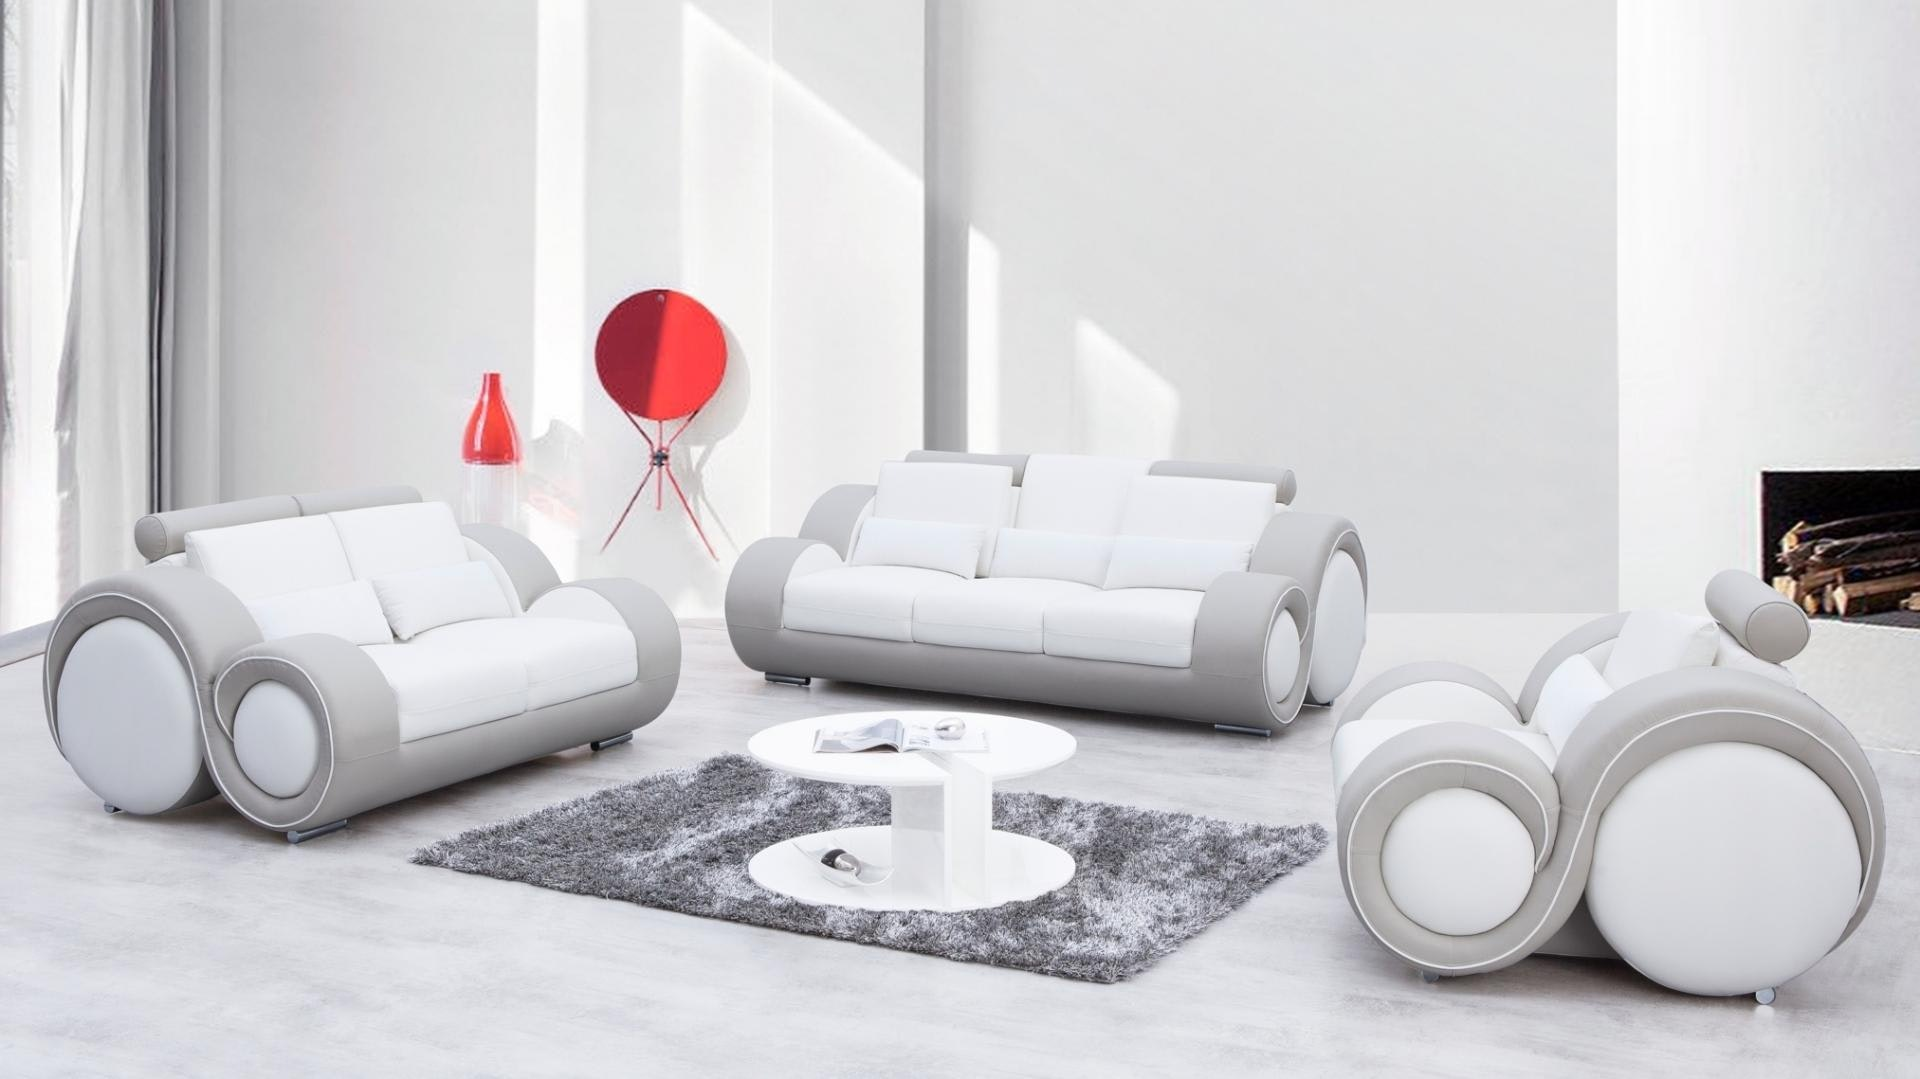 unwind leather sofa suite 3 2 1 lounge life. Black Bedroom Furniture Sets. Home Design Ideas